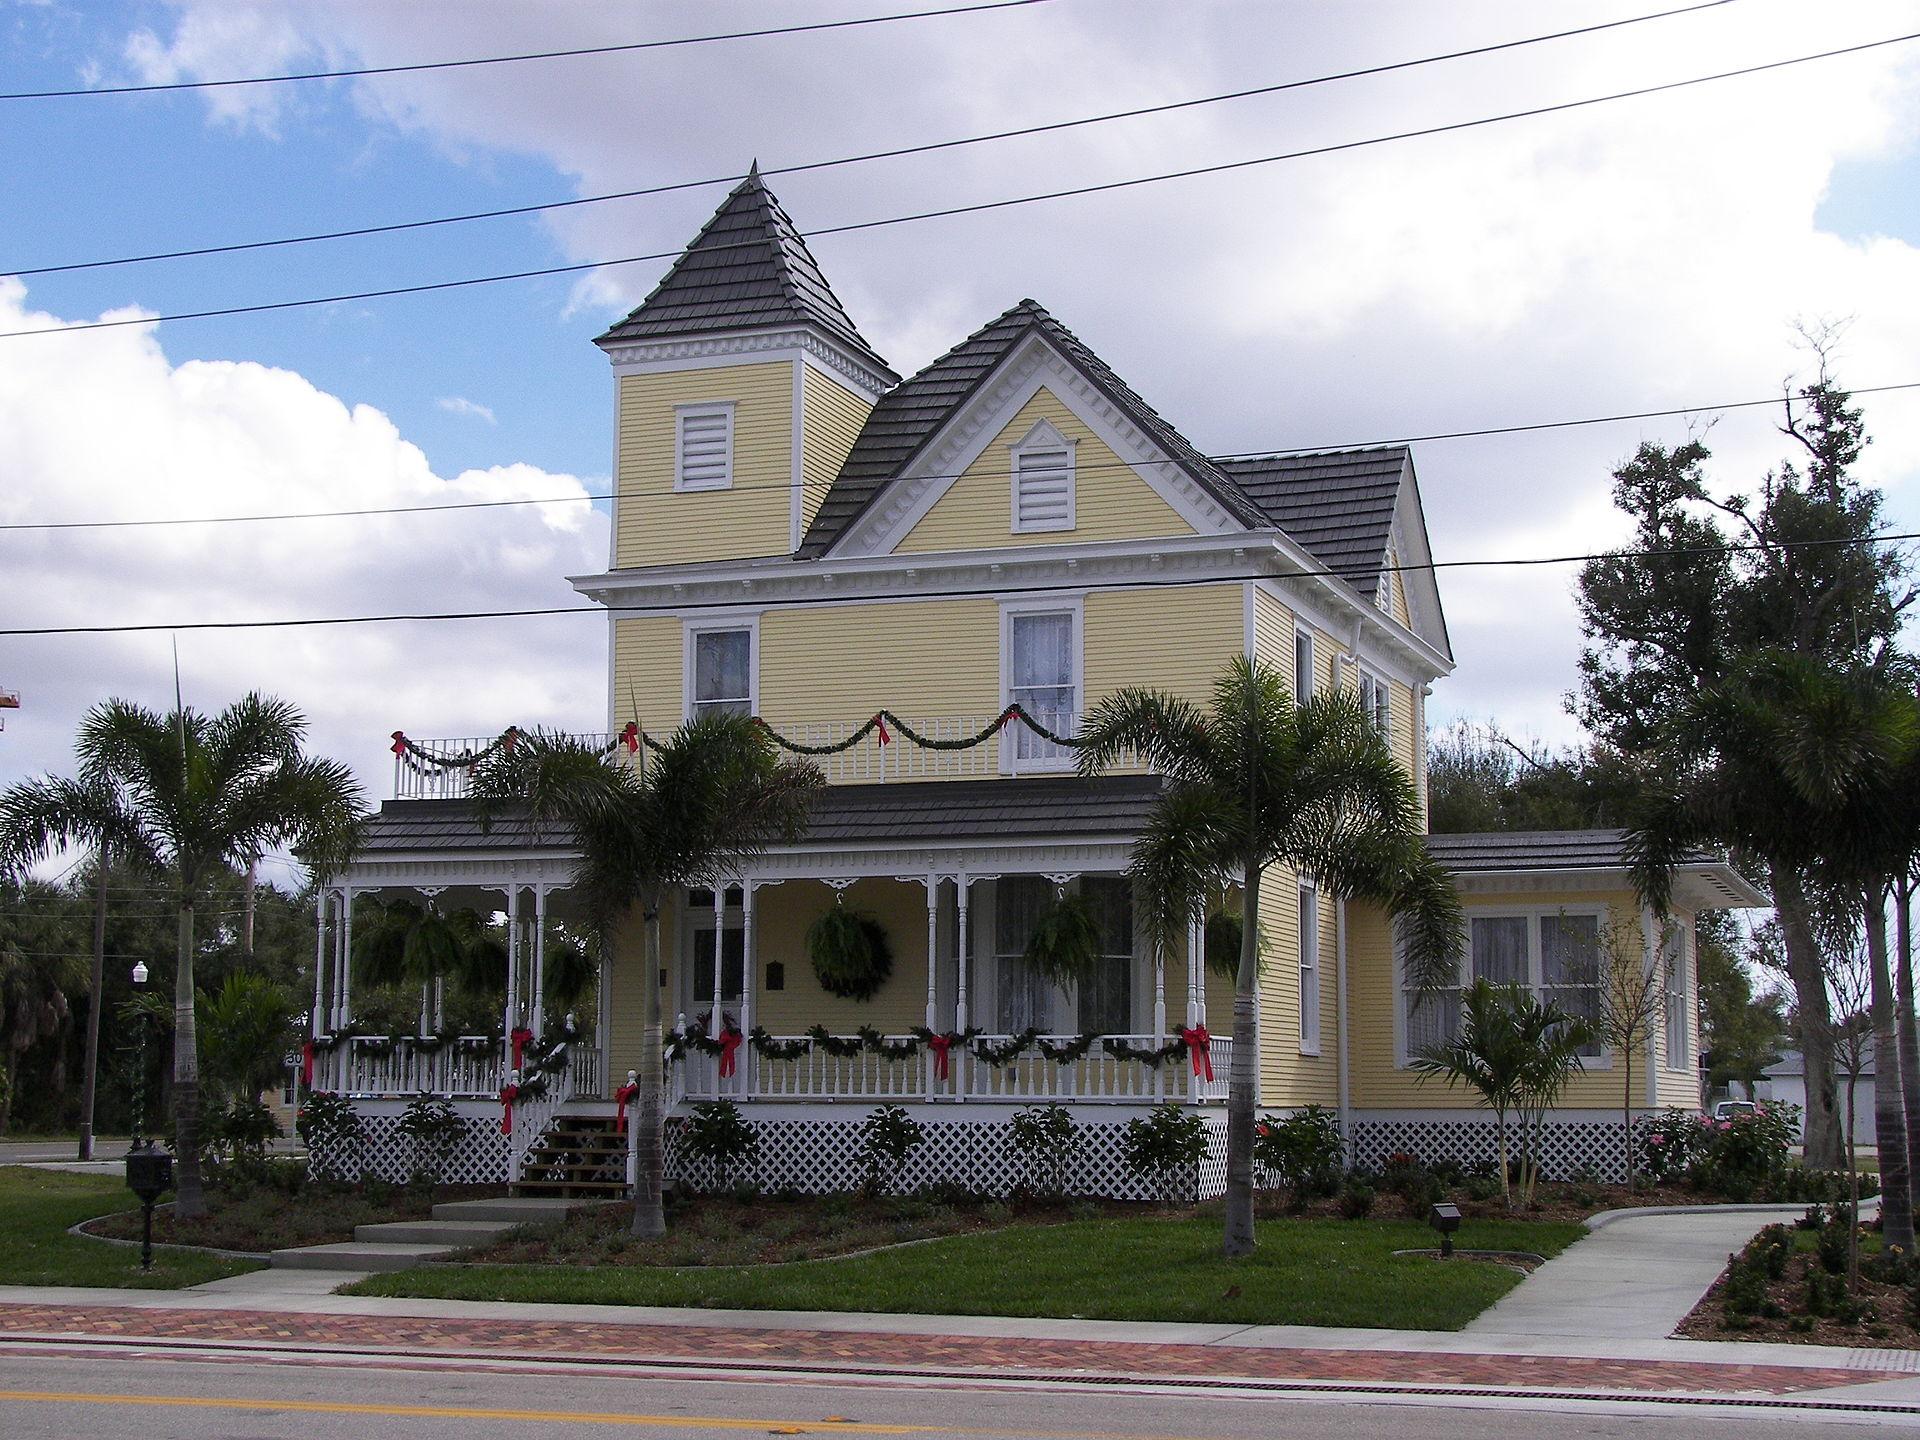 The A.C. Freeman House